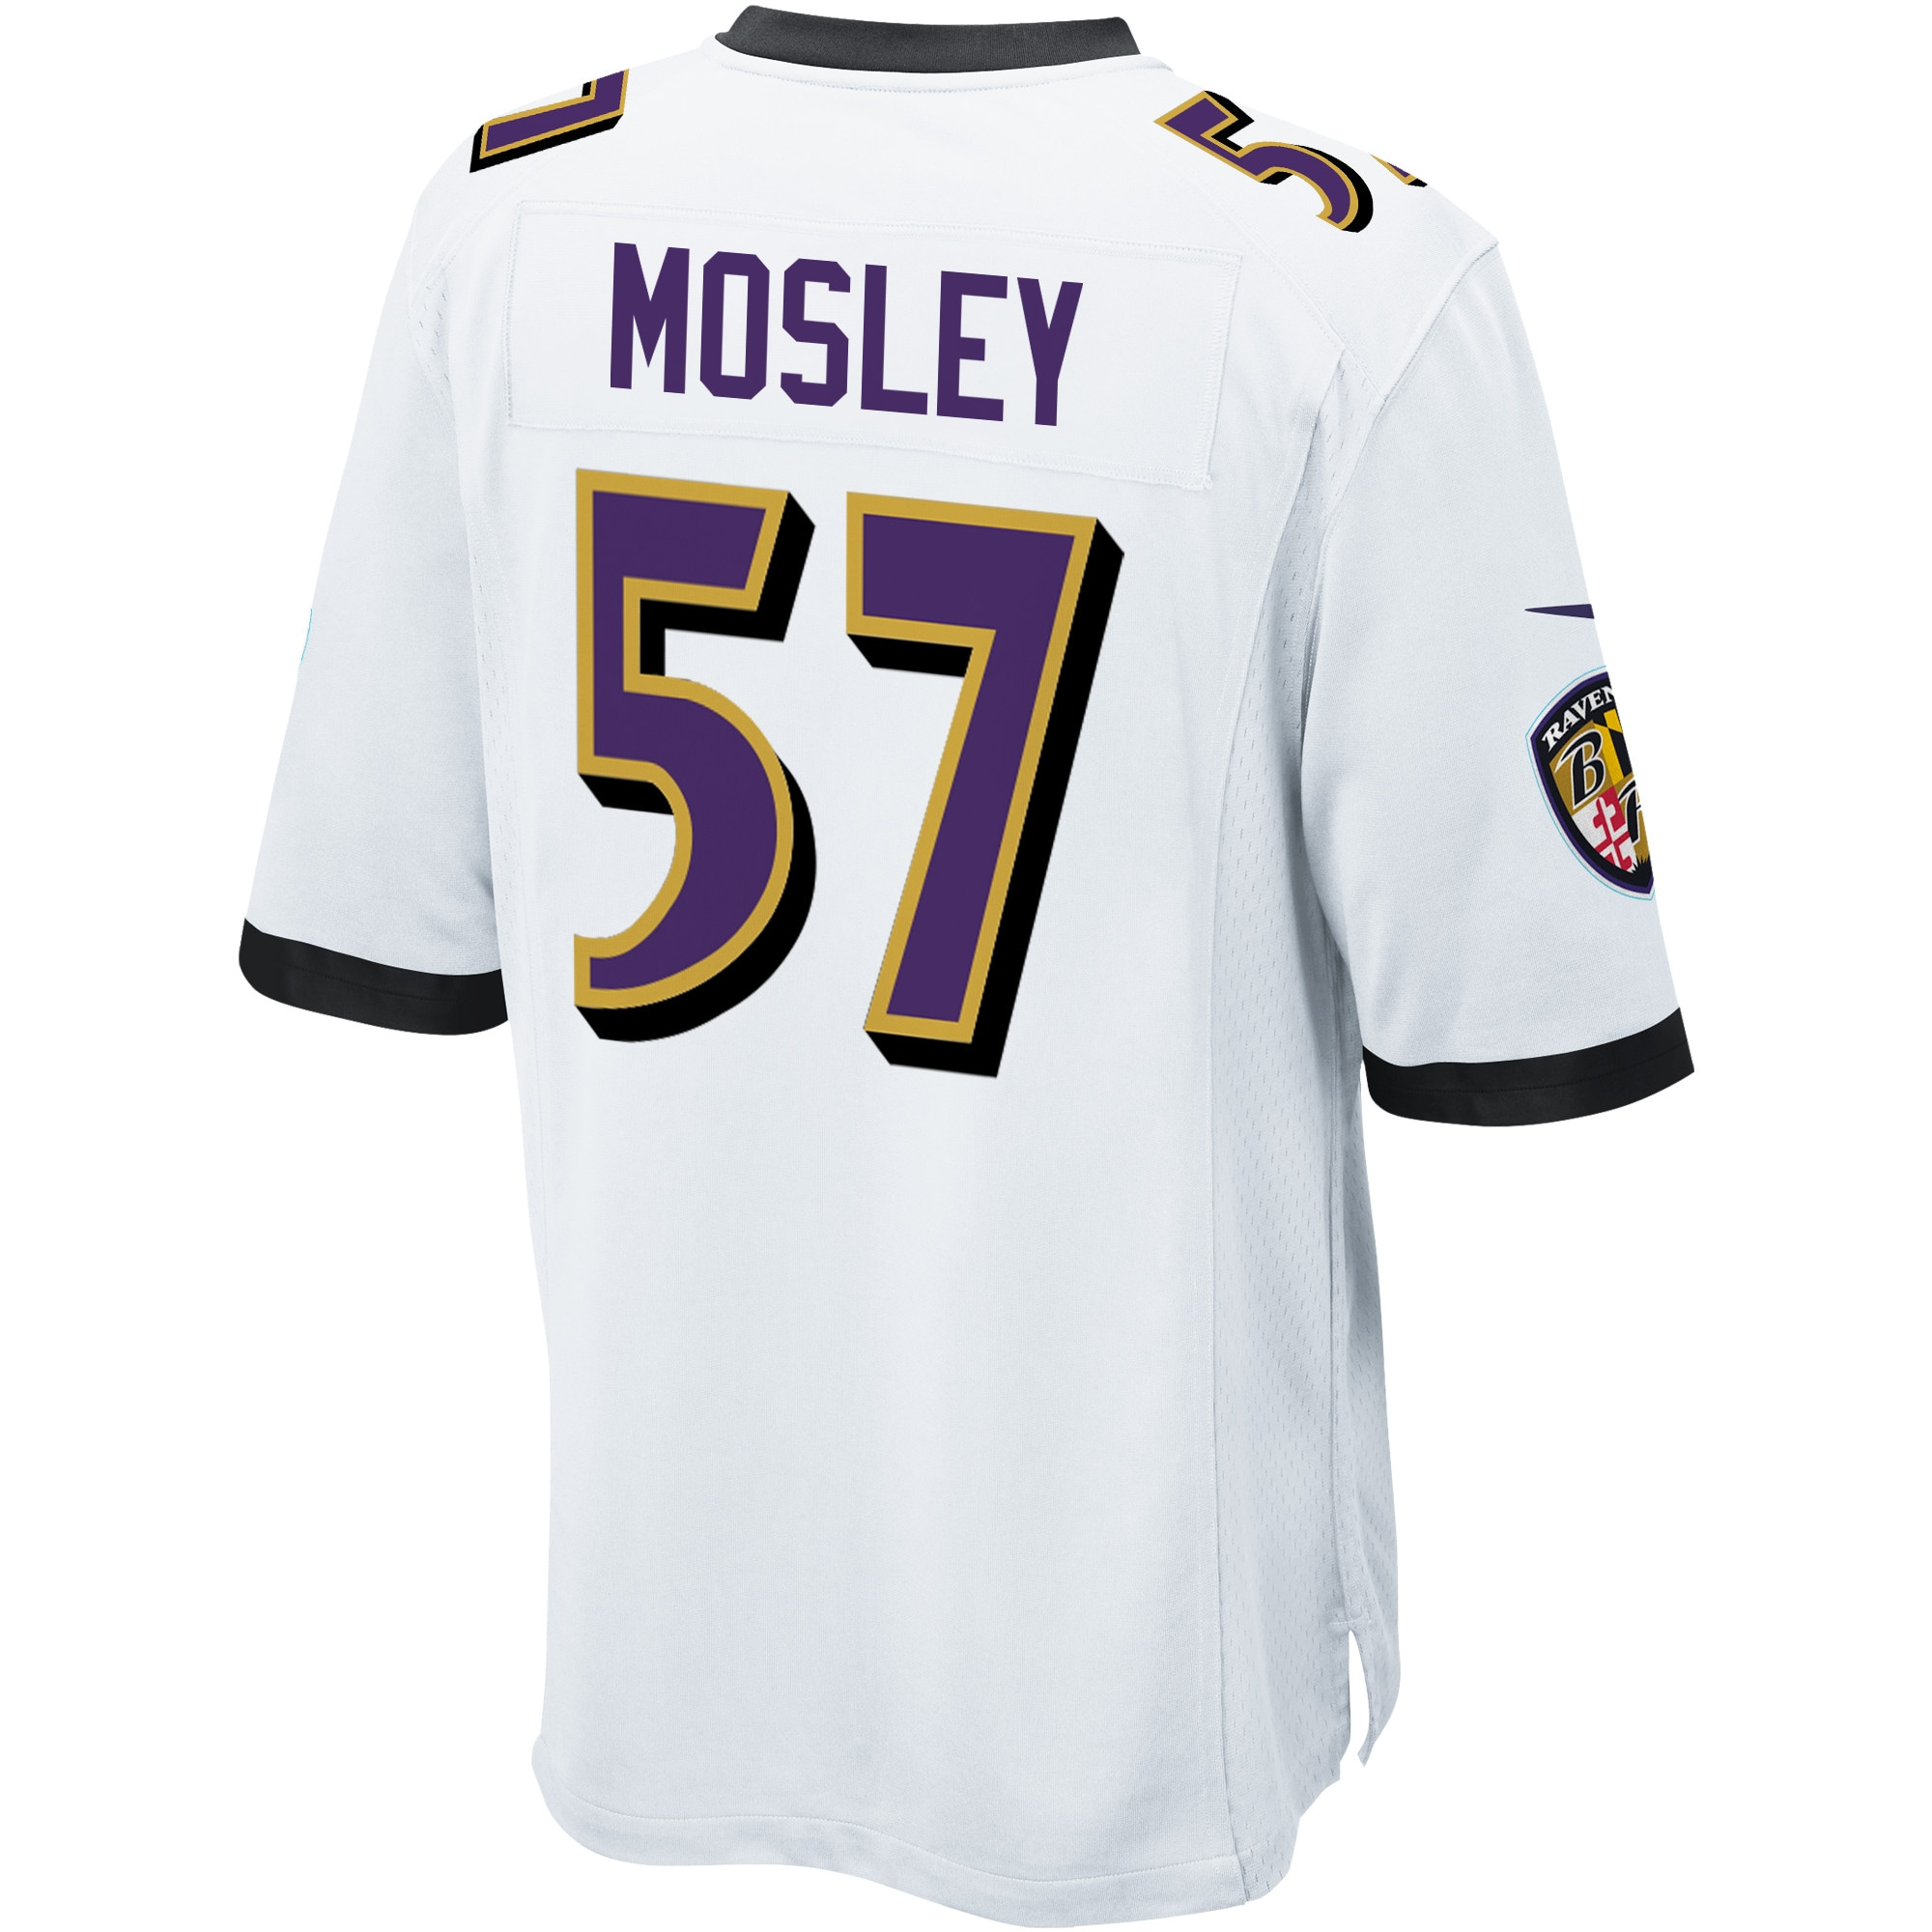 C.J. Mosley Baltimore Ravens Nike Youth Game Jersey - White